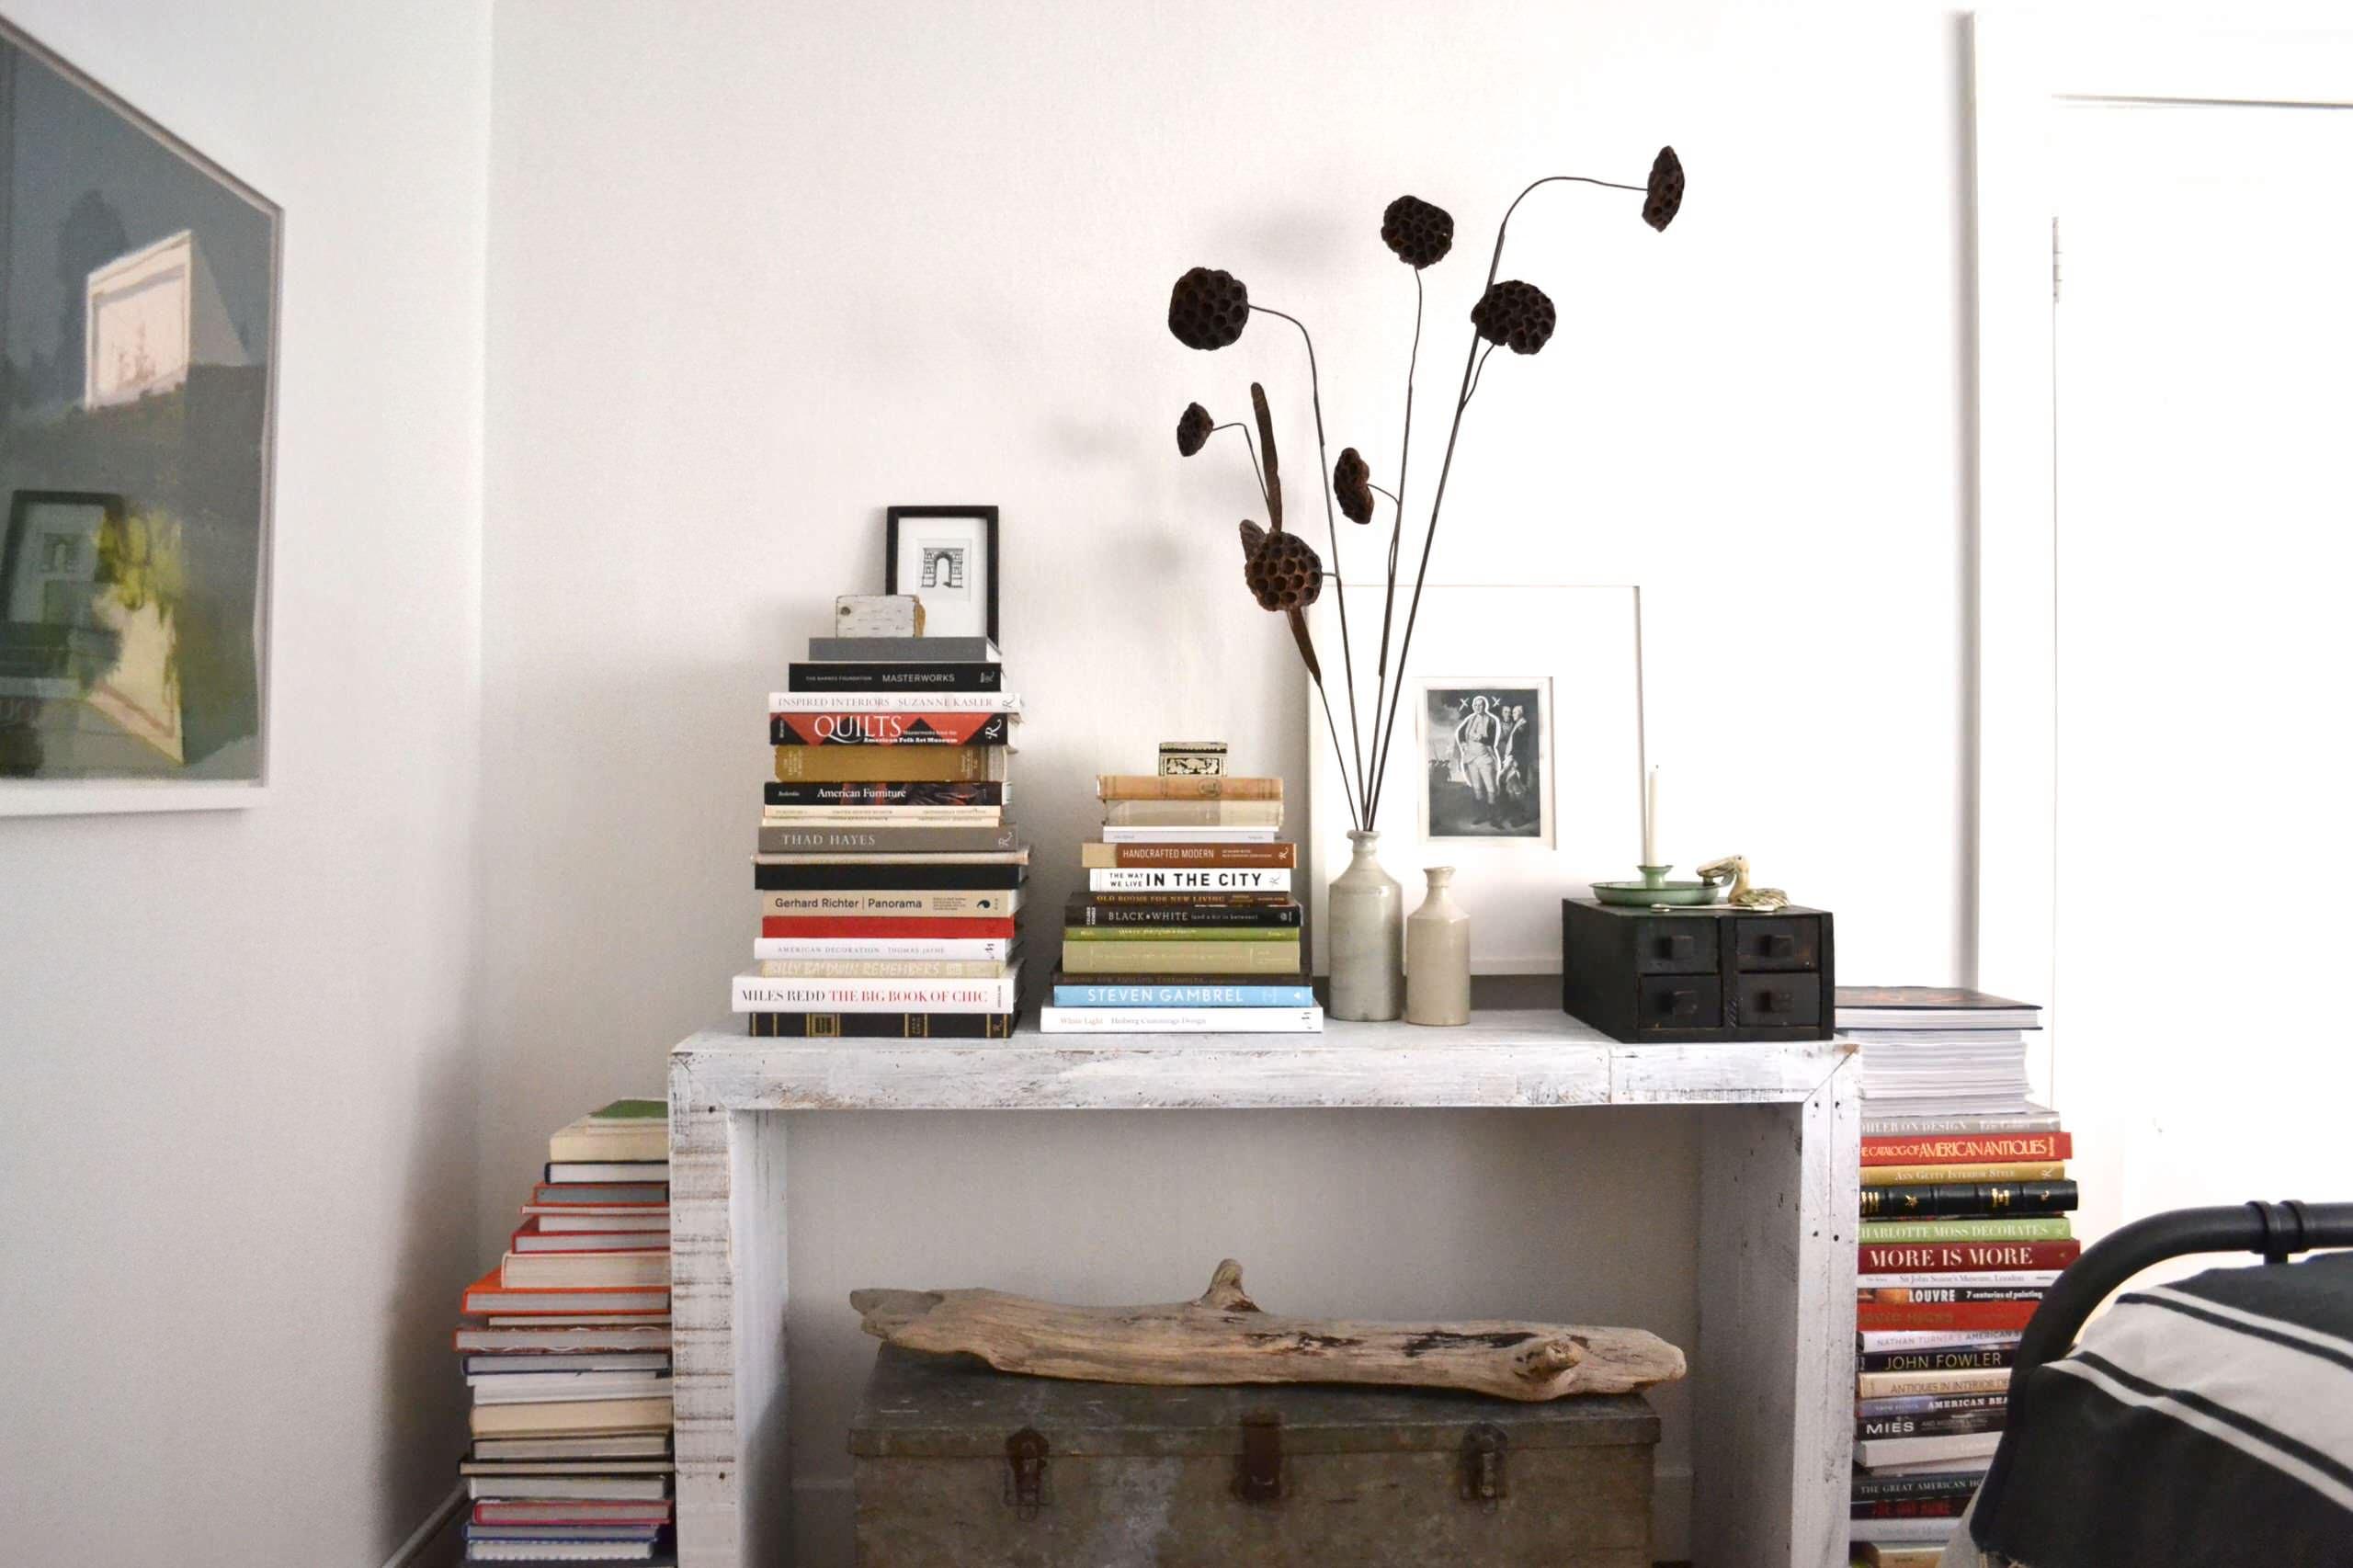 Mesa decorativa con libros